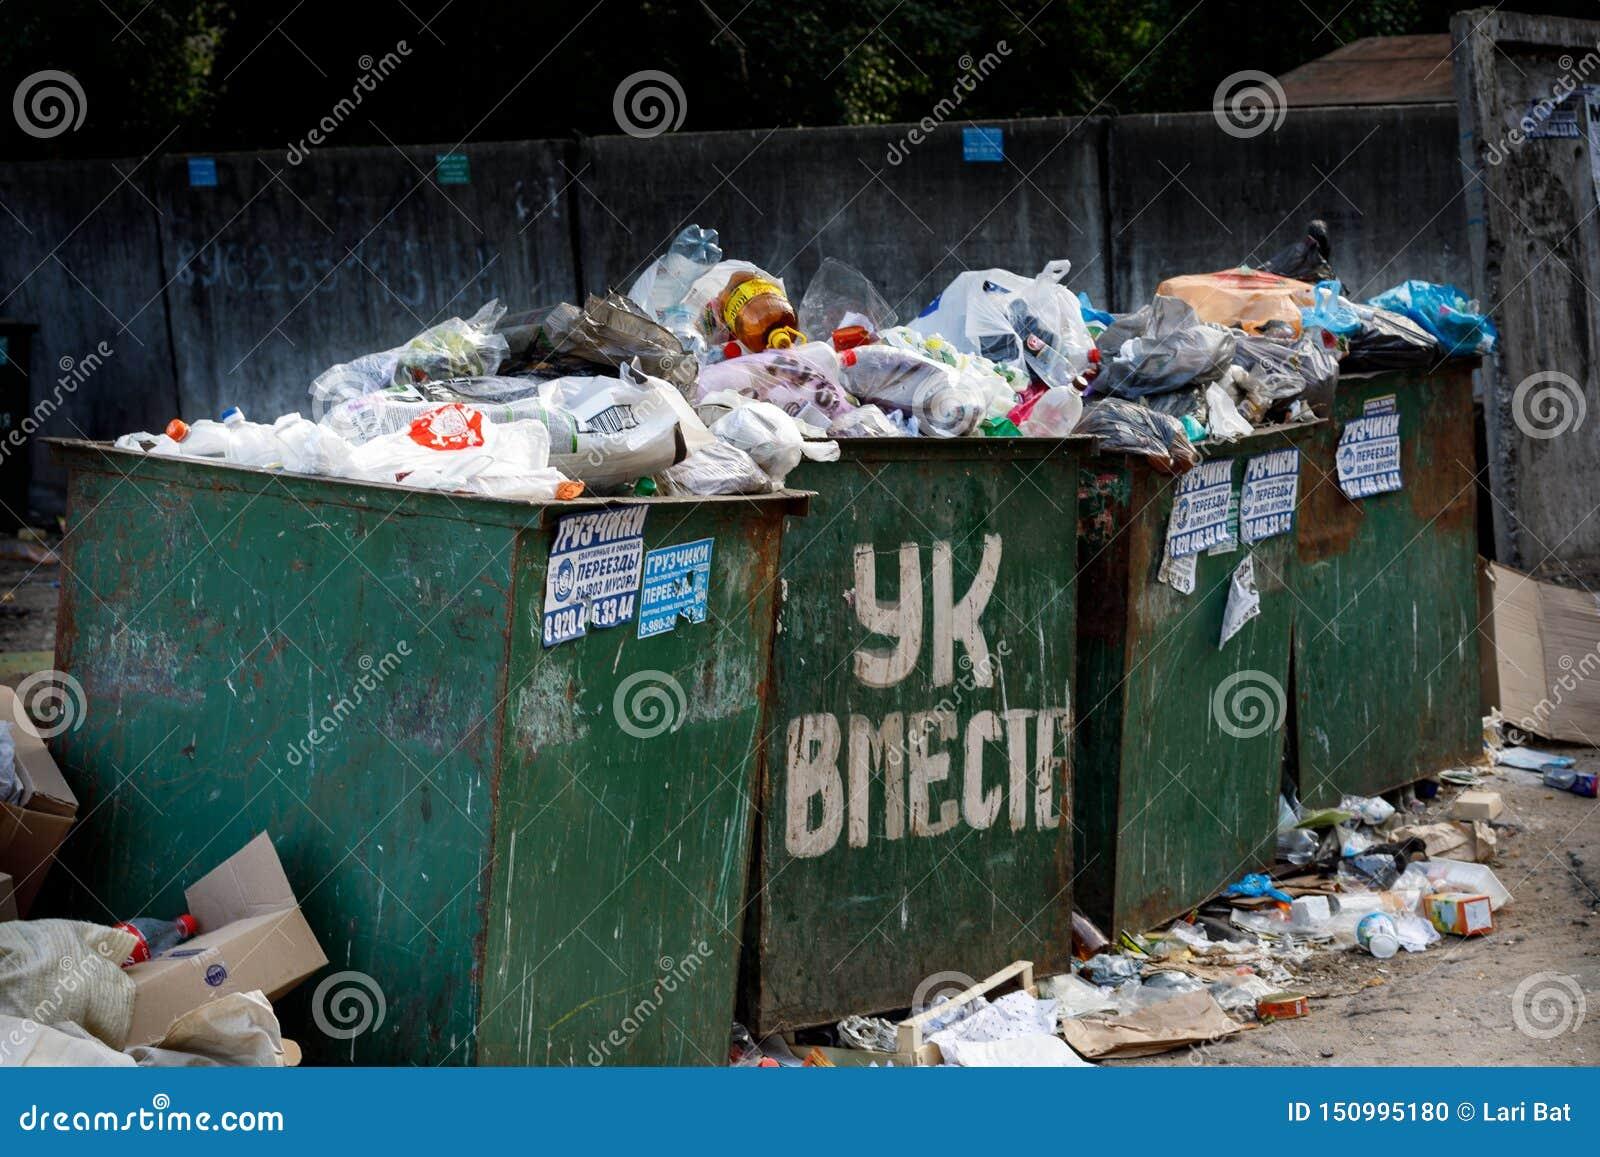 download ppsspp trash box ru